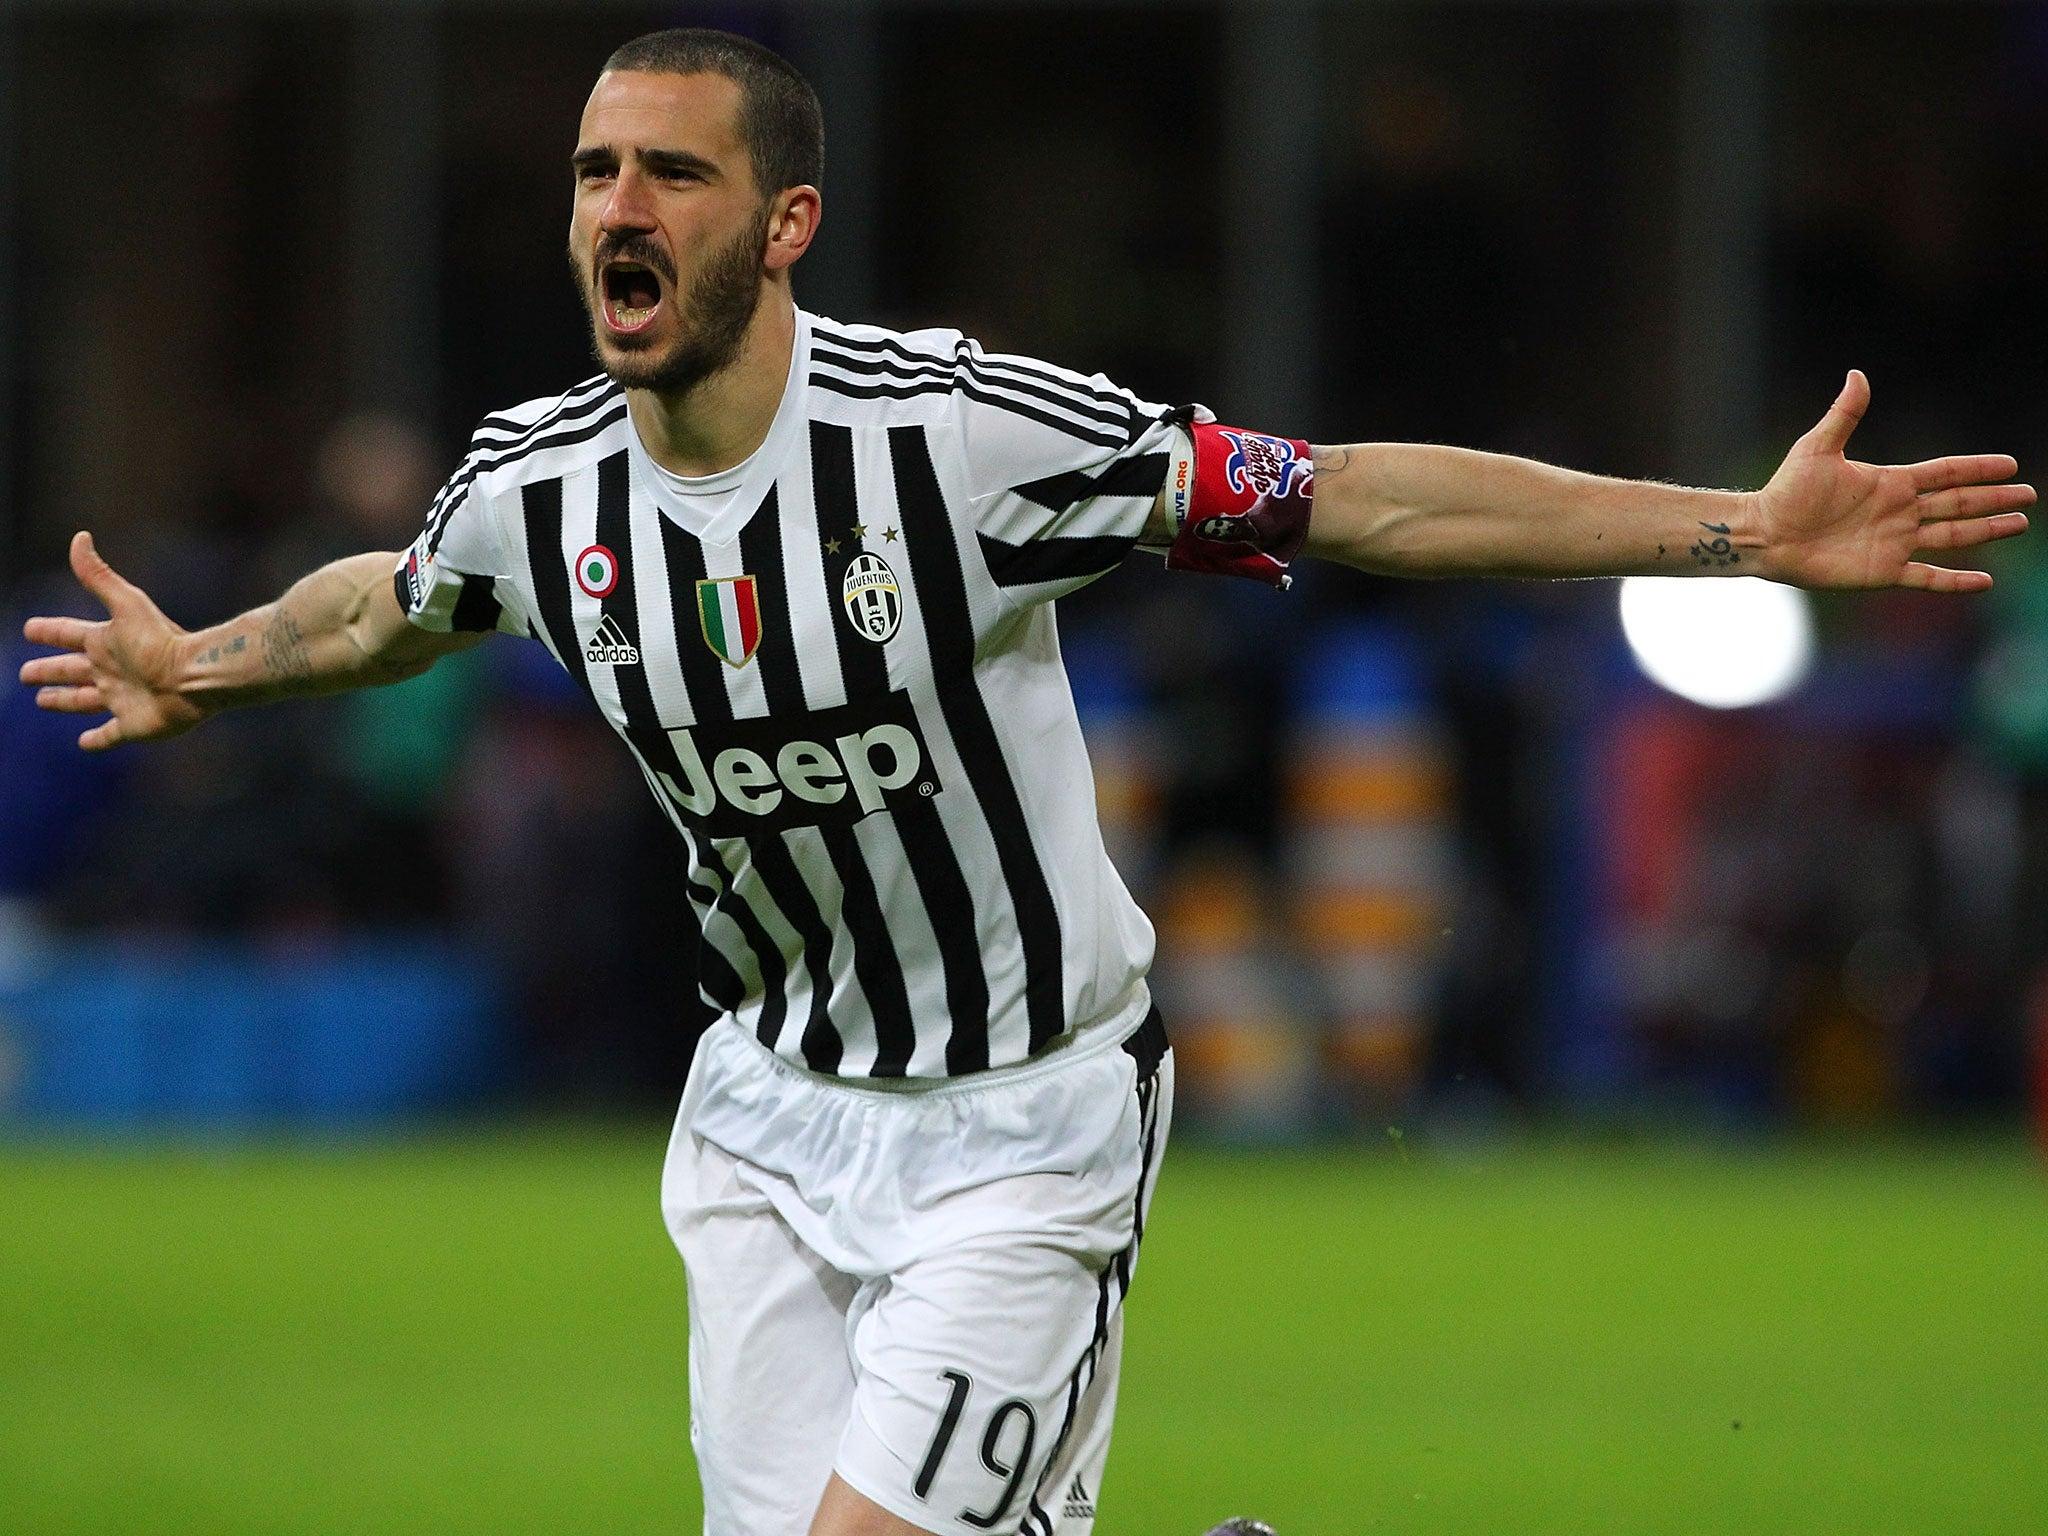 Leonardo Bonucci Juventus prepared to let defender join Chelsea